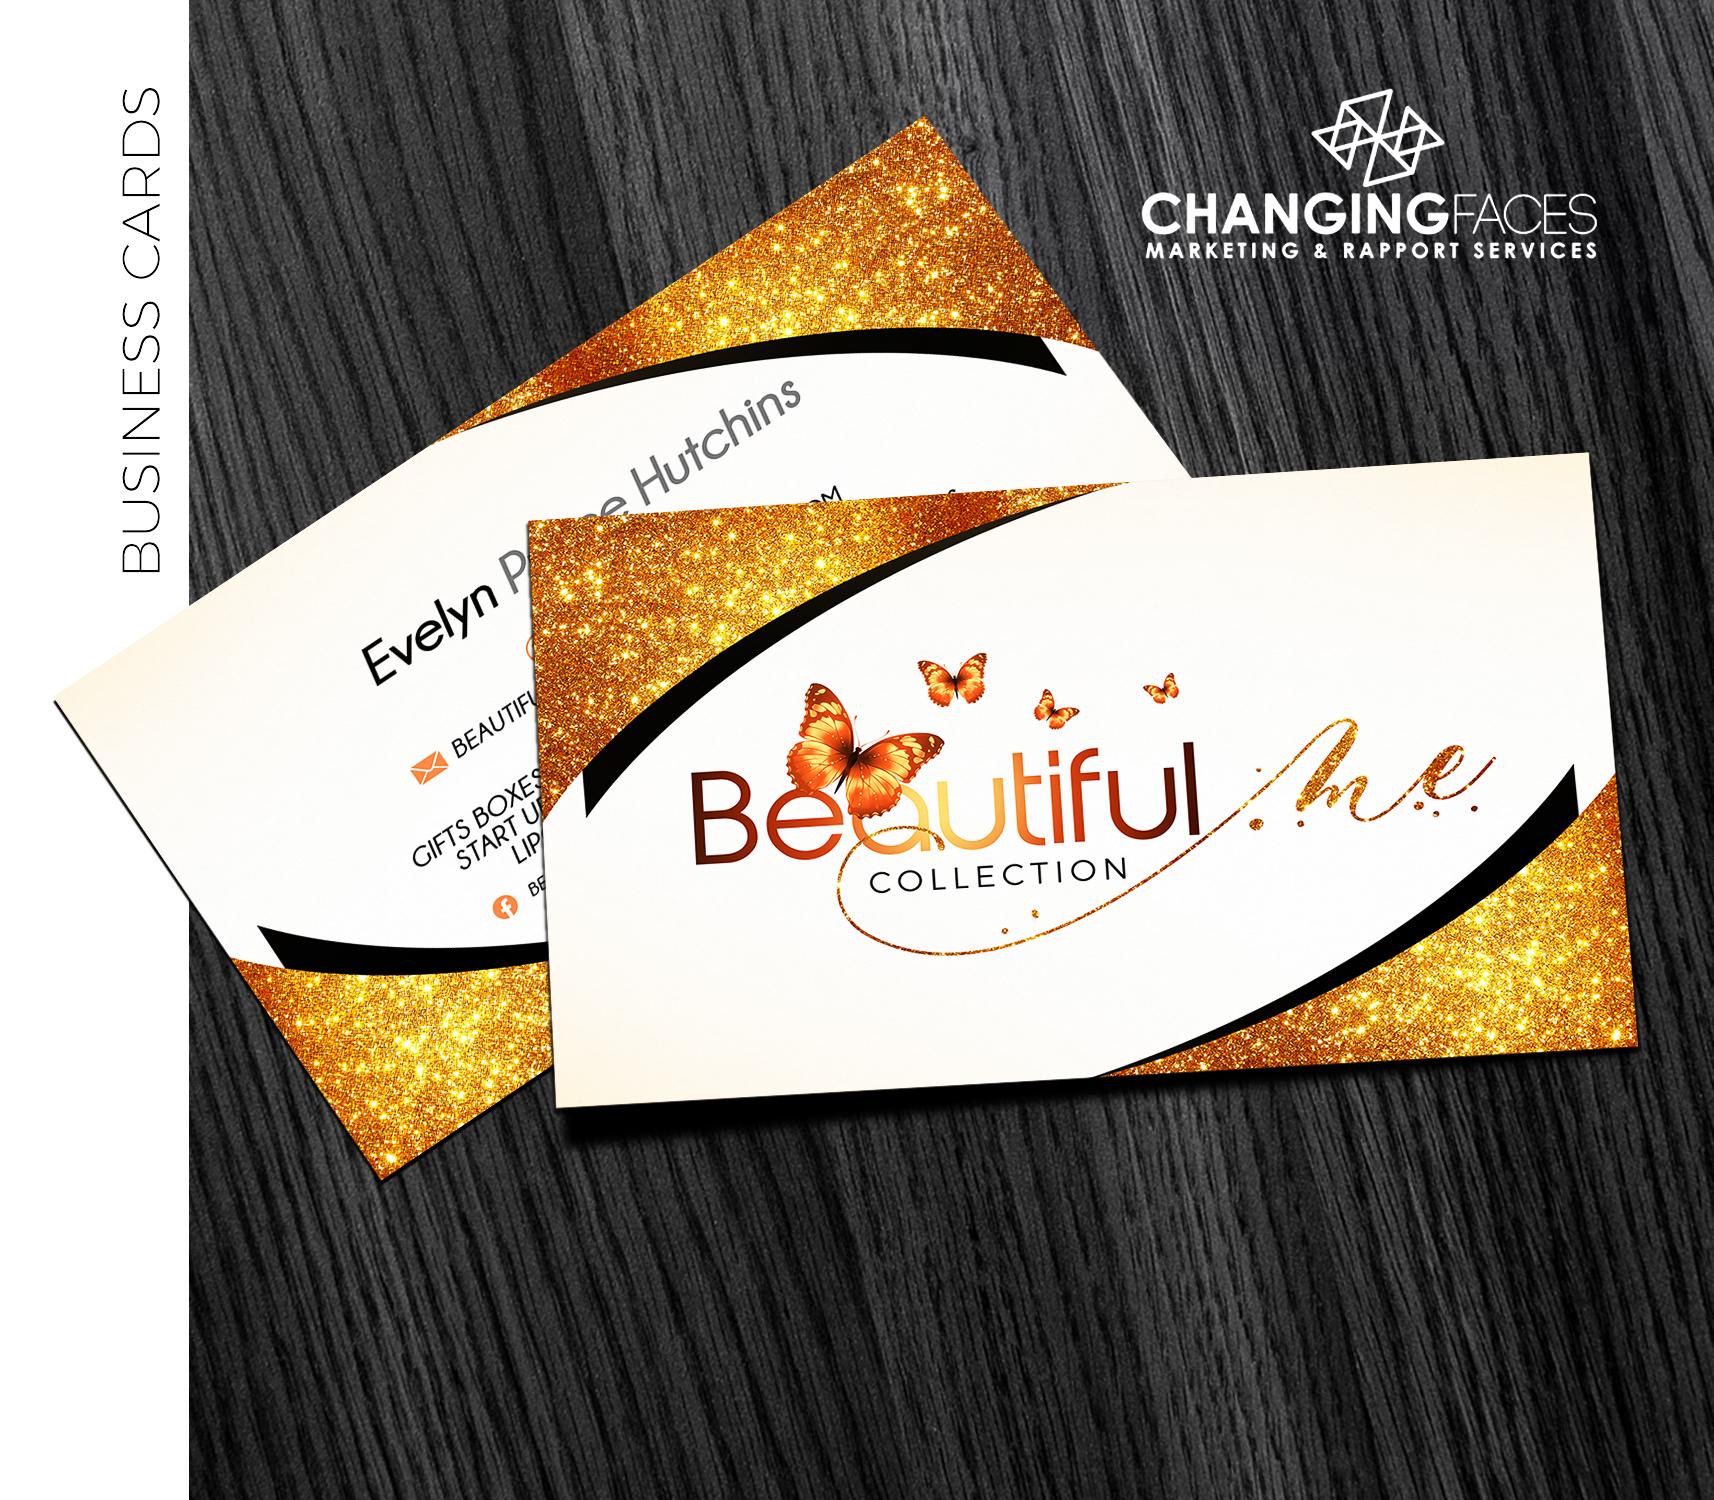 business cards mockup (1)